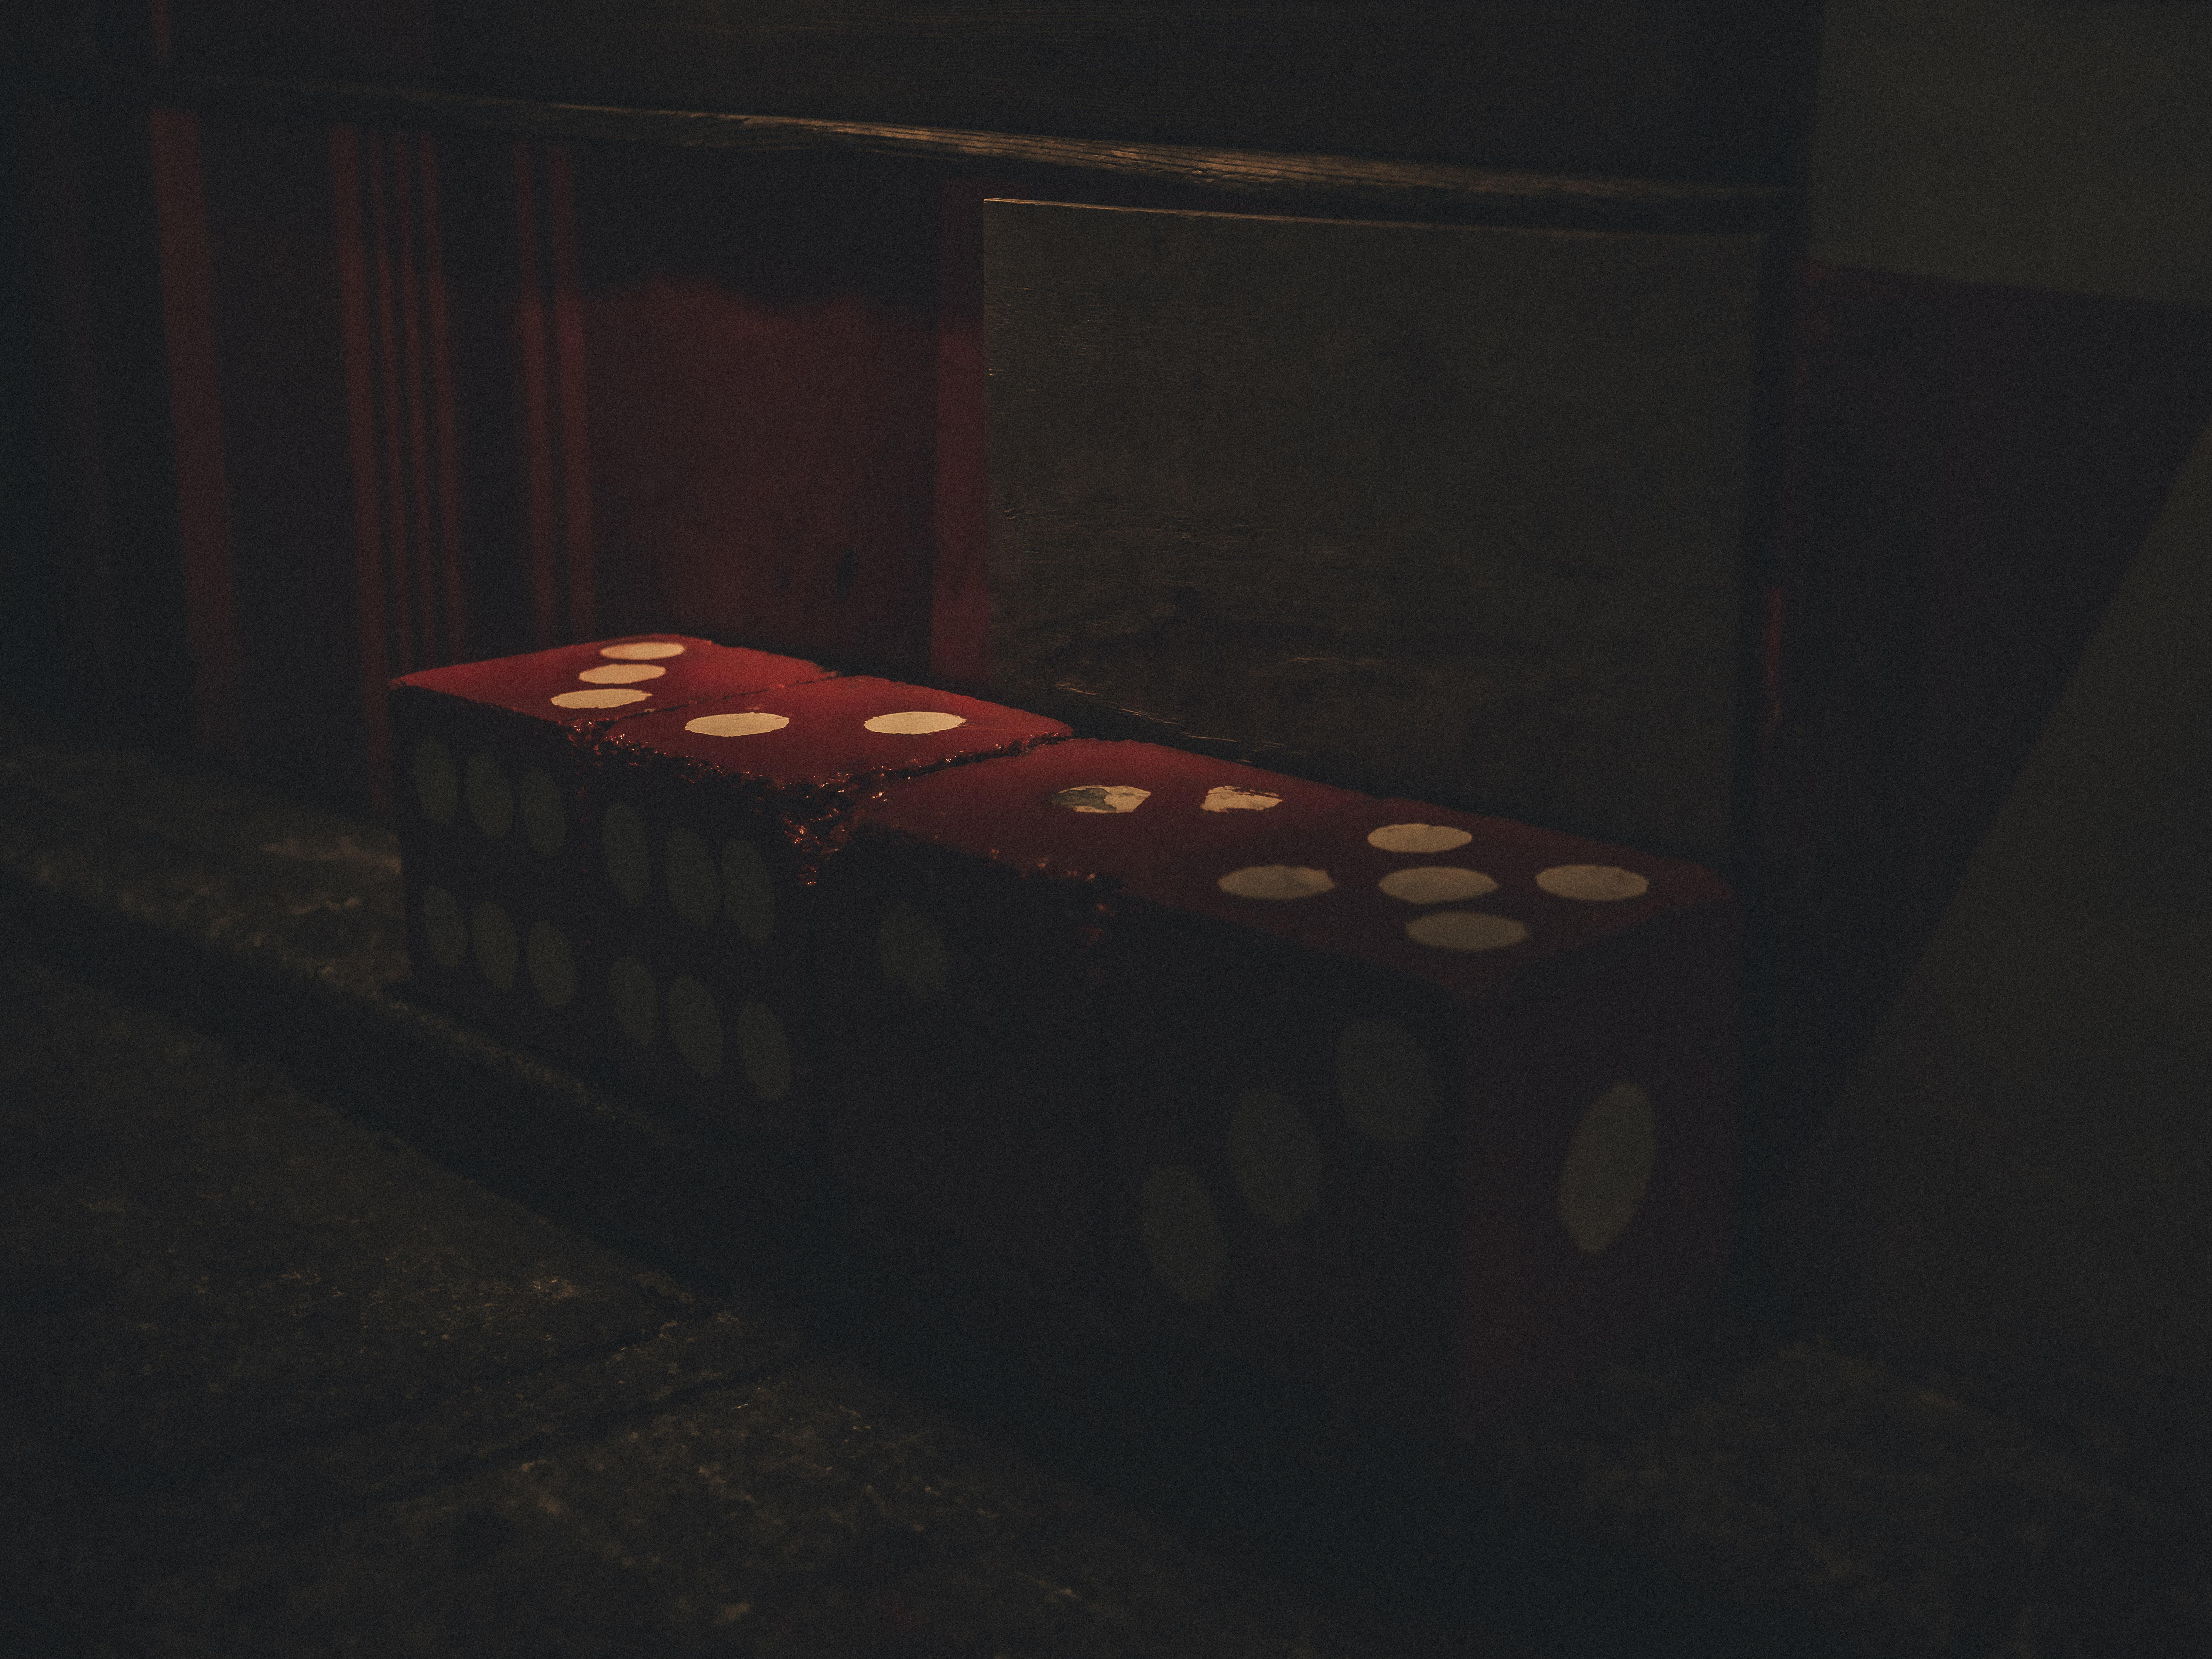 NIGHT ORDER #62